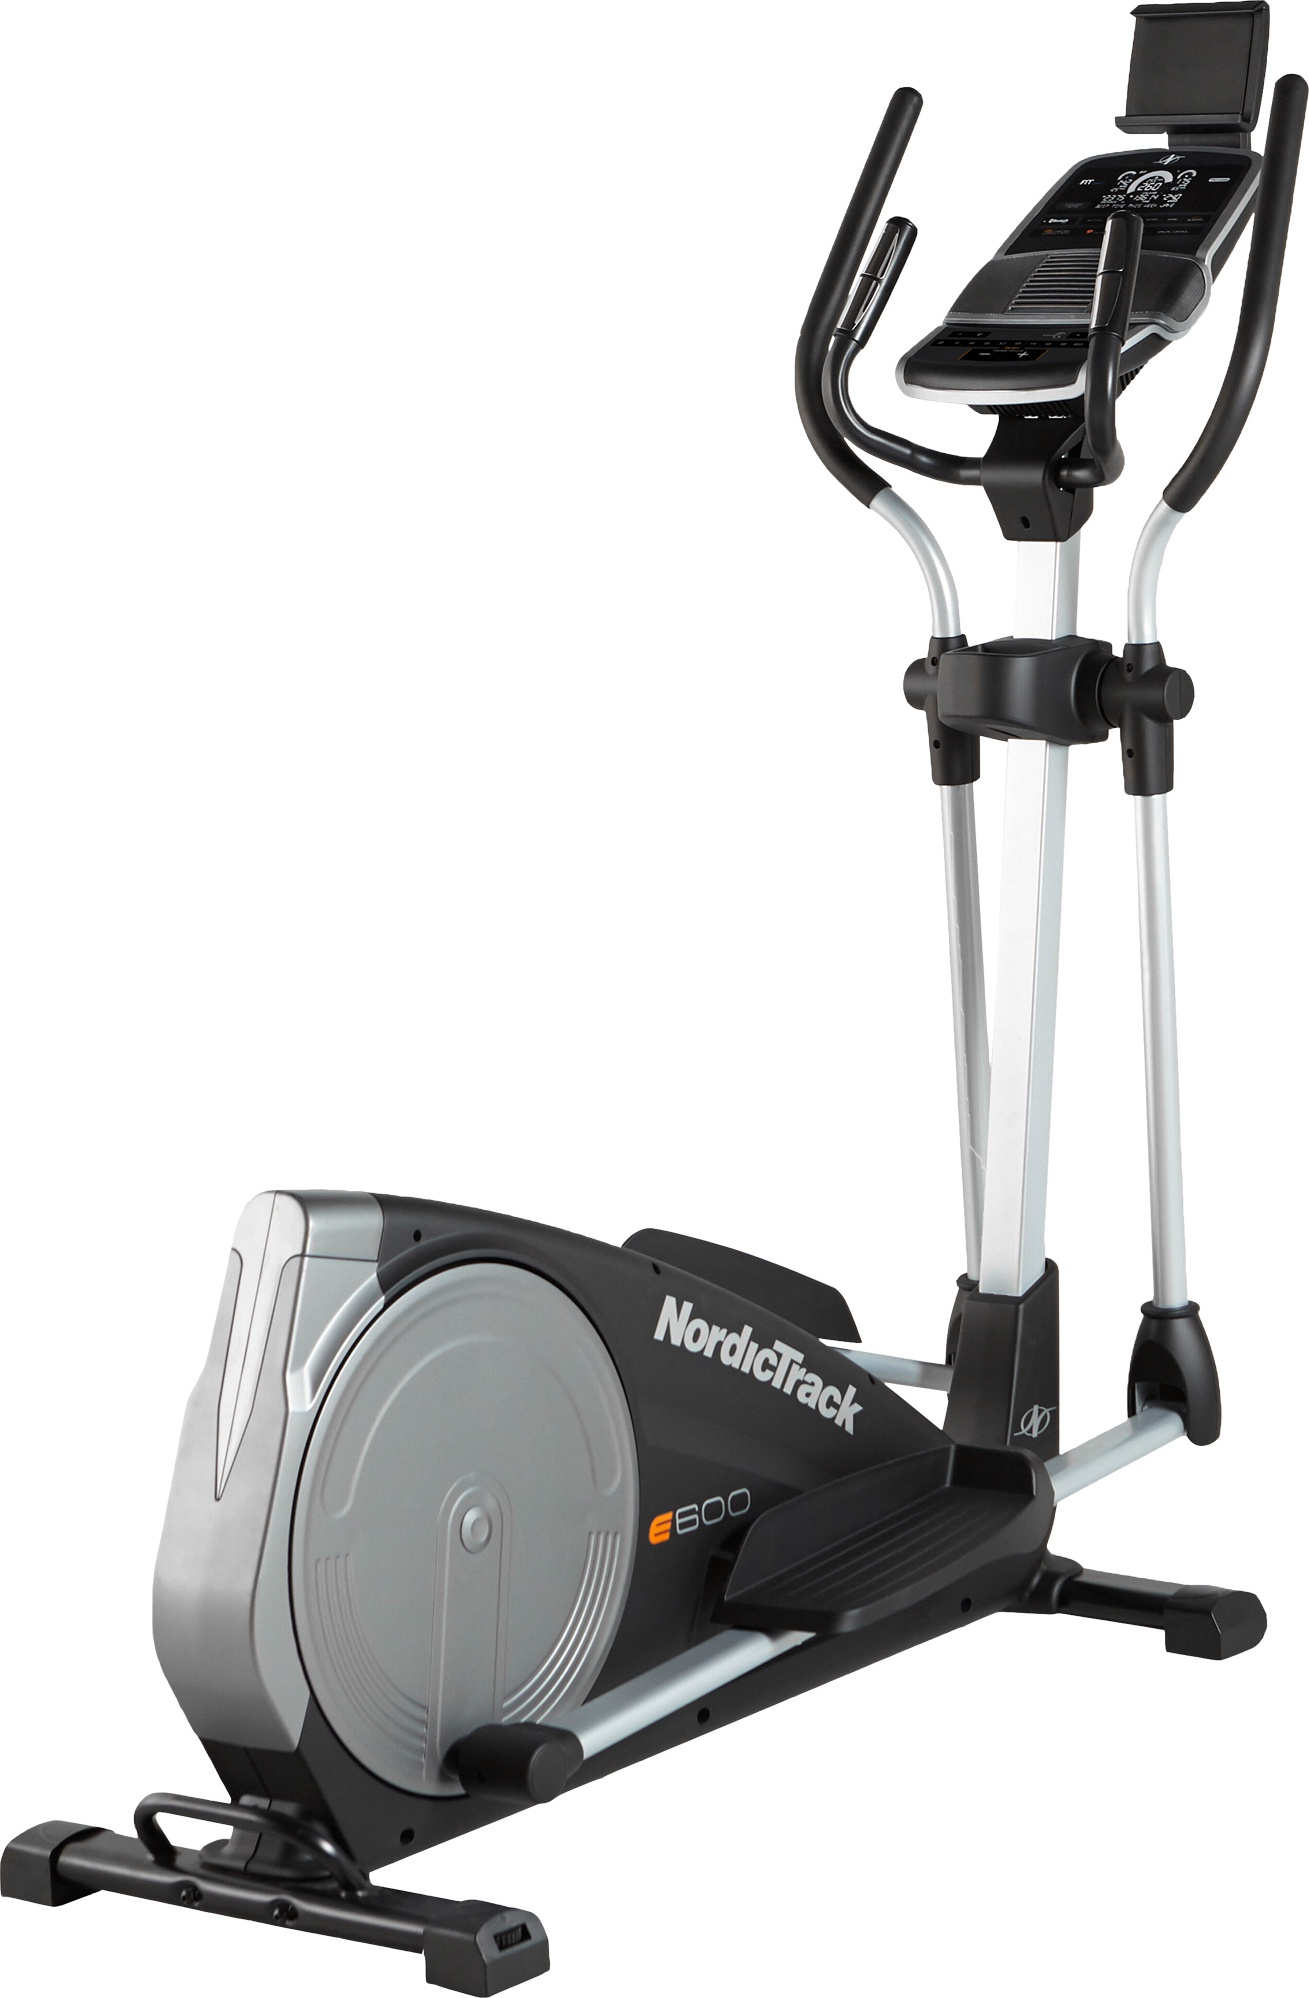 Эллиптический тренажер NORDICTRACK E 600 эллиптический тренажер housefit